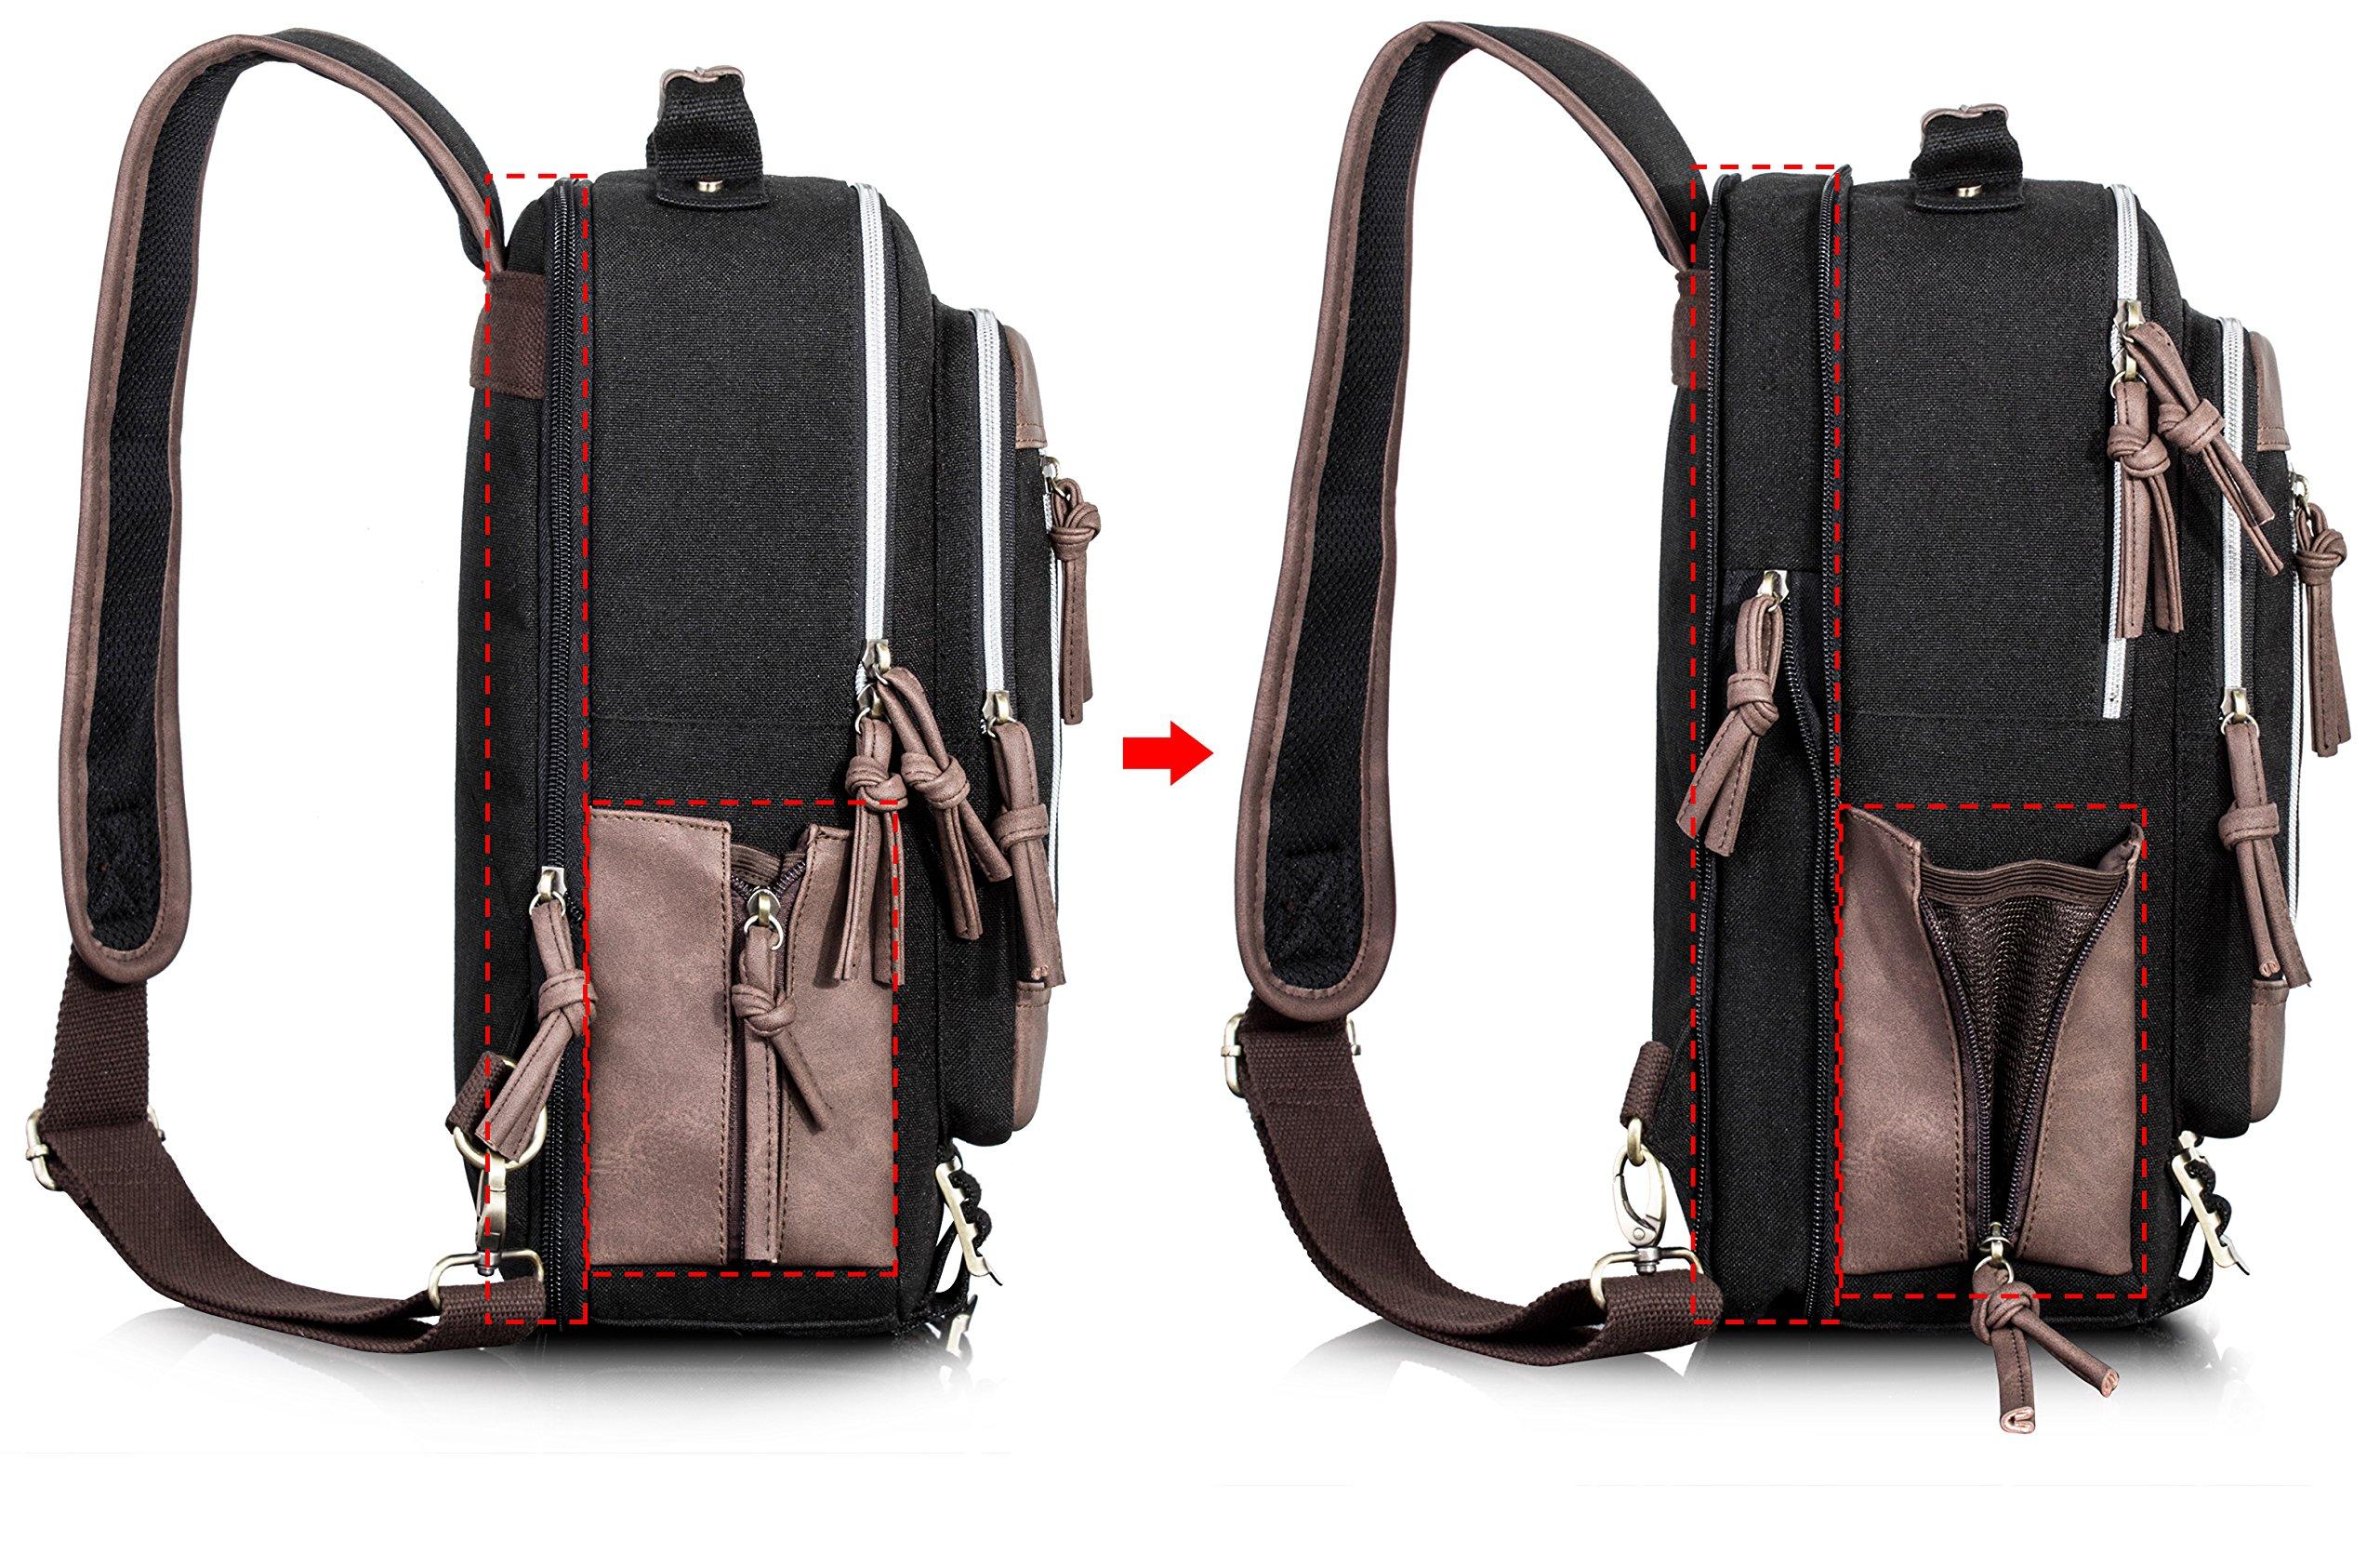 Leaper Retro Messenger Bag Outdoor Cross Body Sling Bag Travel Bag Shoulder Backpack (Black3103) by Leaper (Image #5)